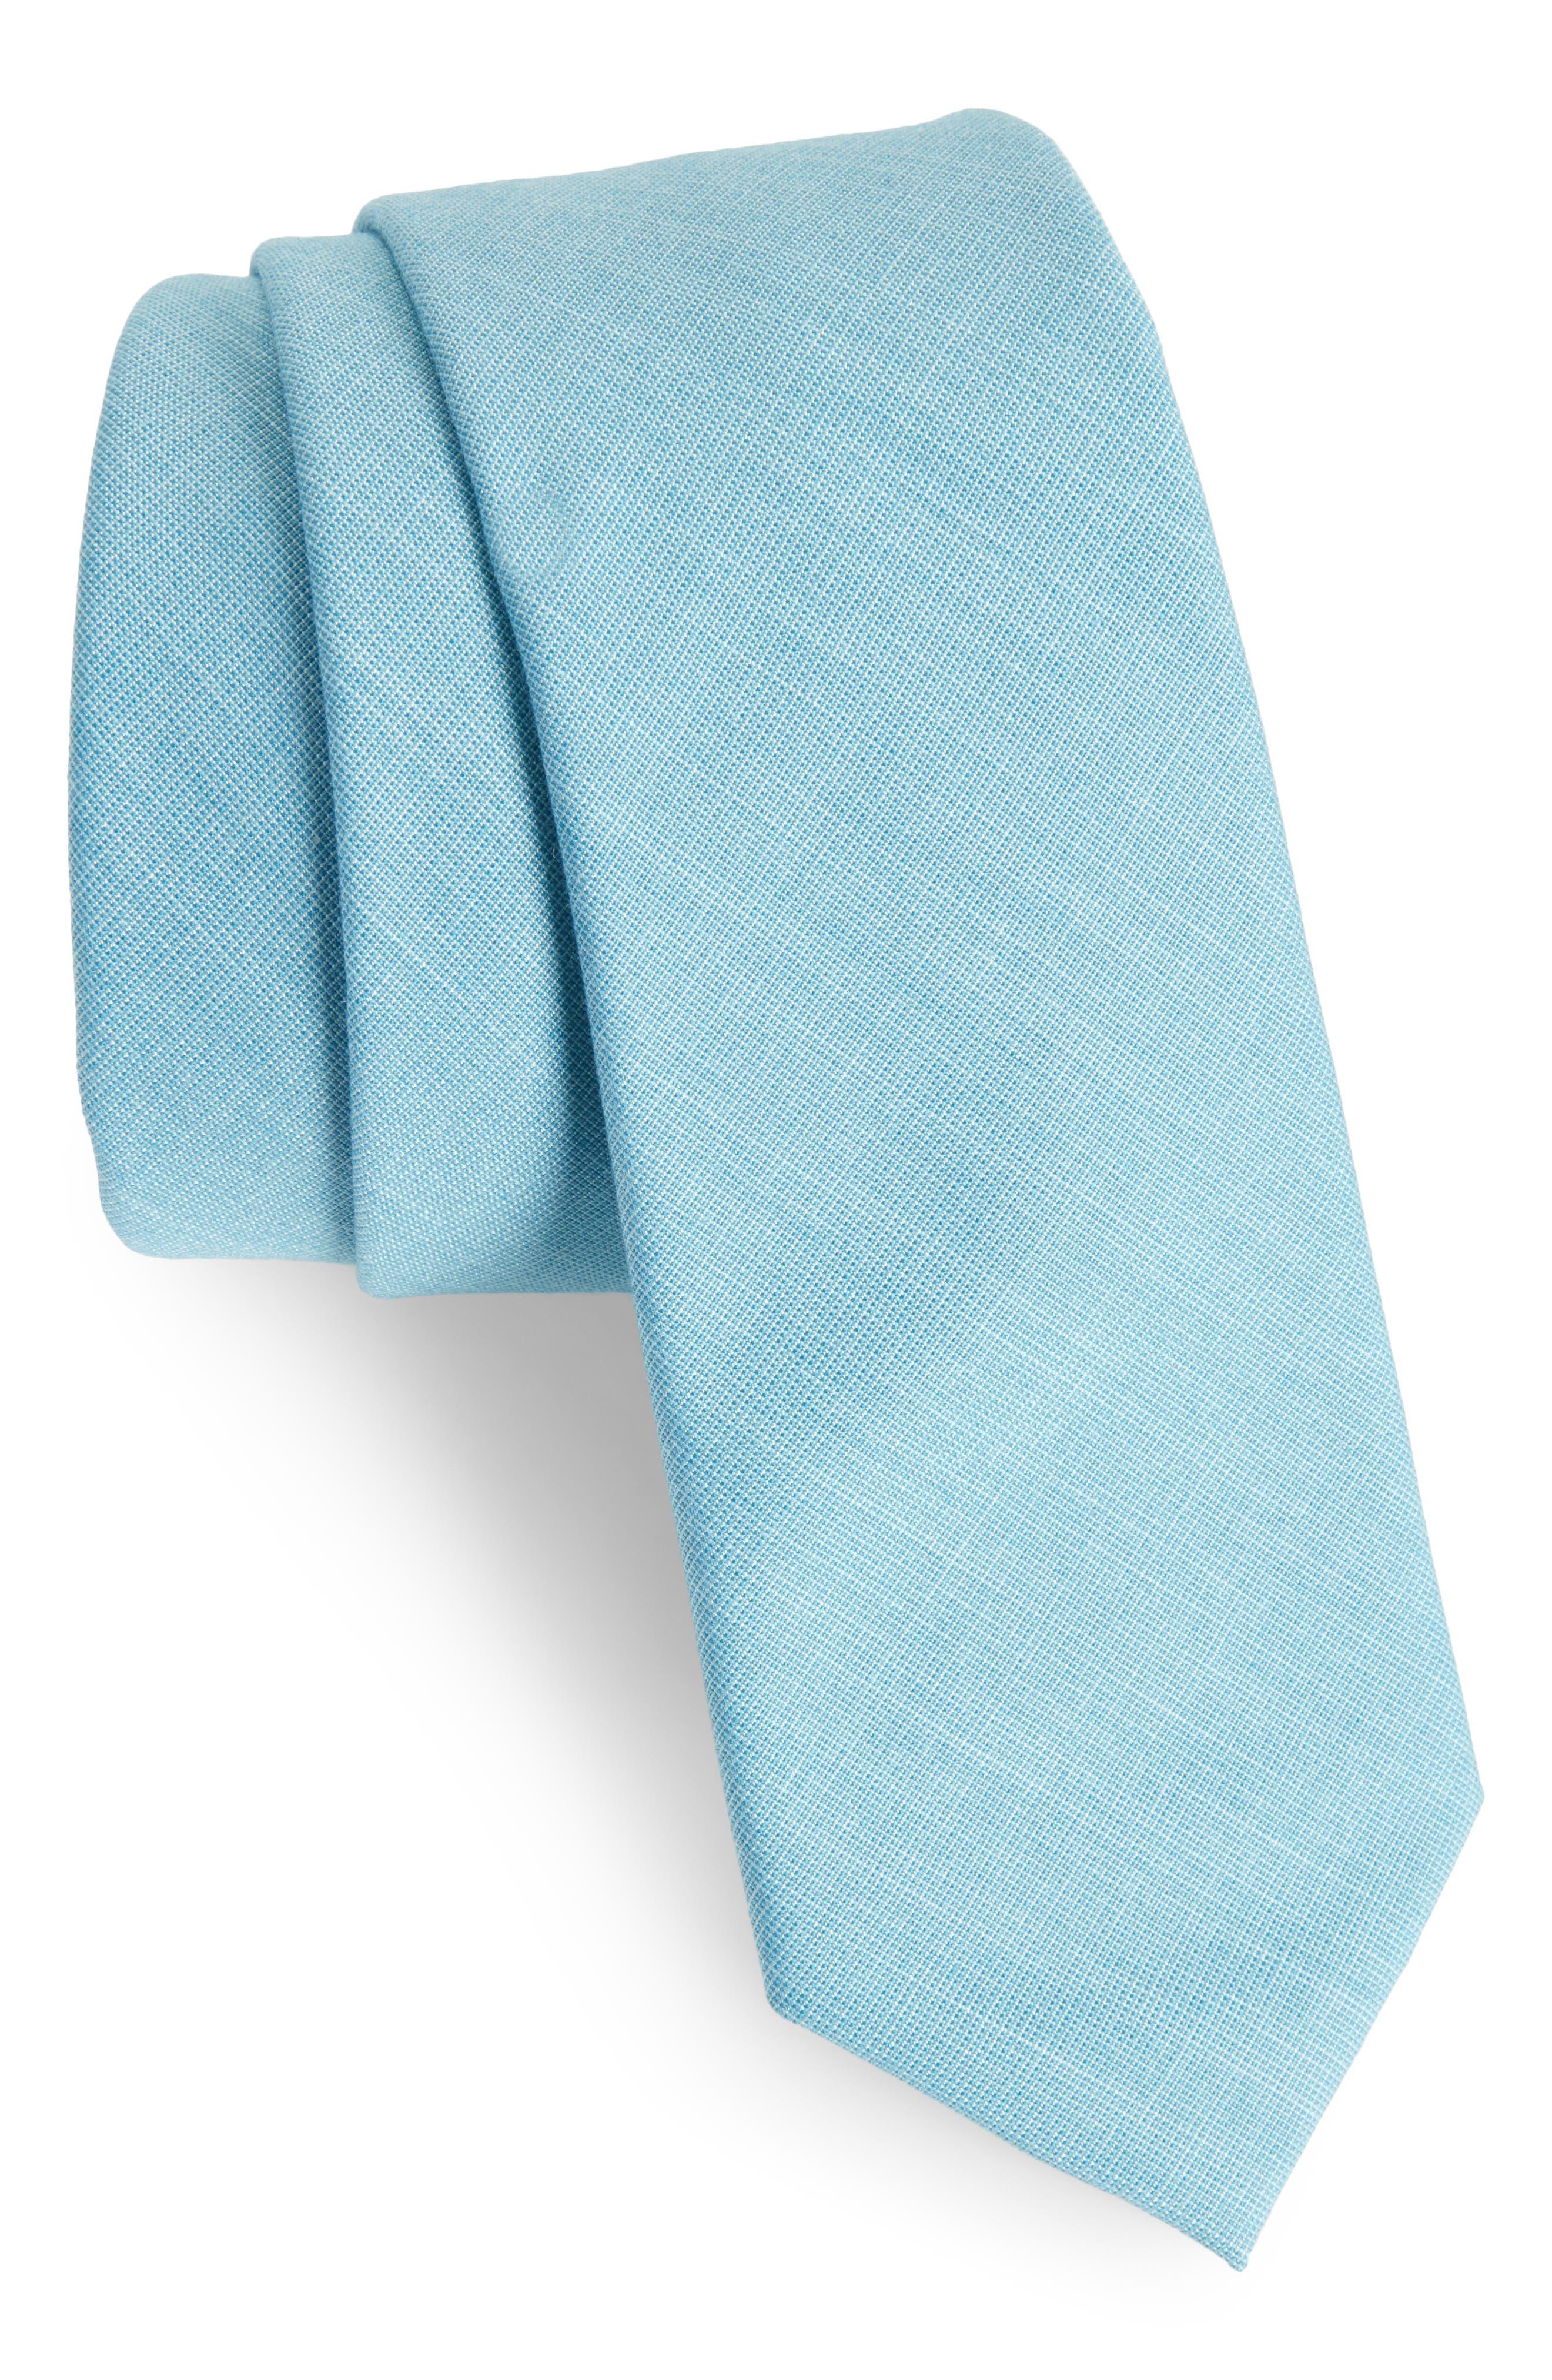 Main Image - Nordstrom Men's Shop Jeffry Solid Skinny Tie